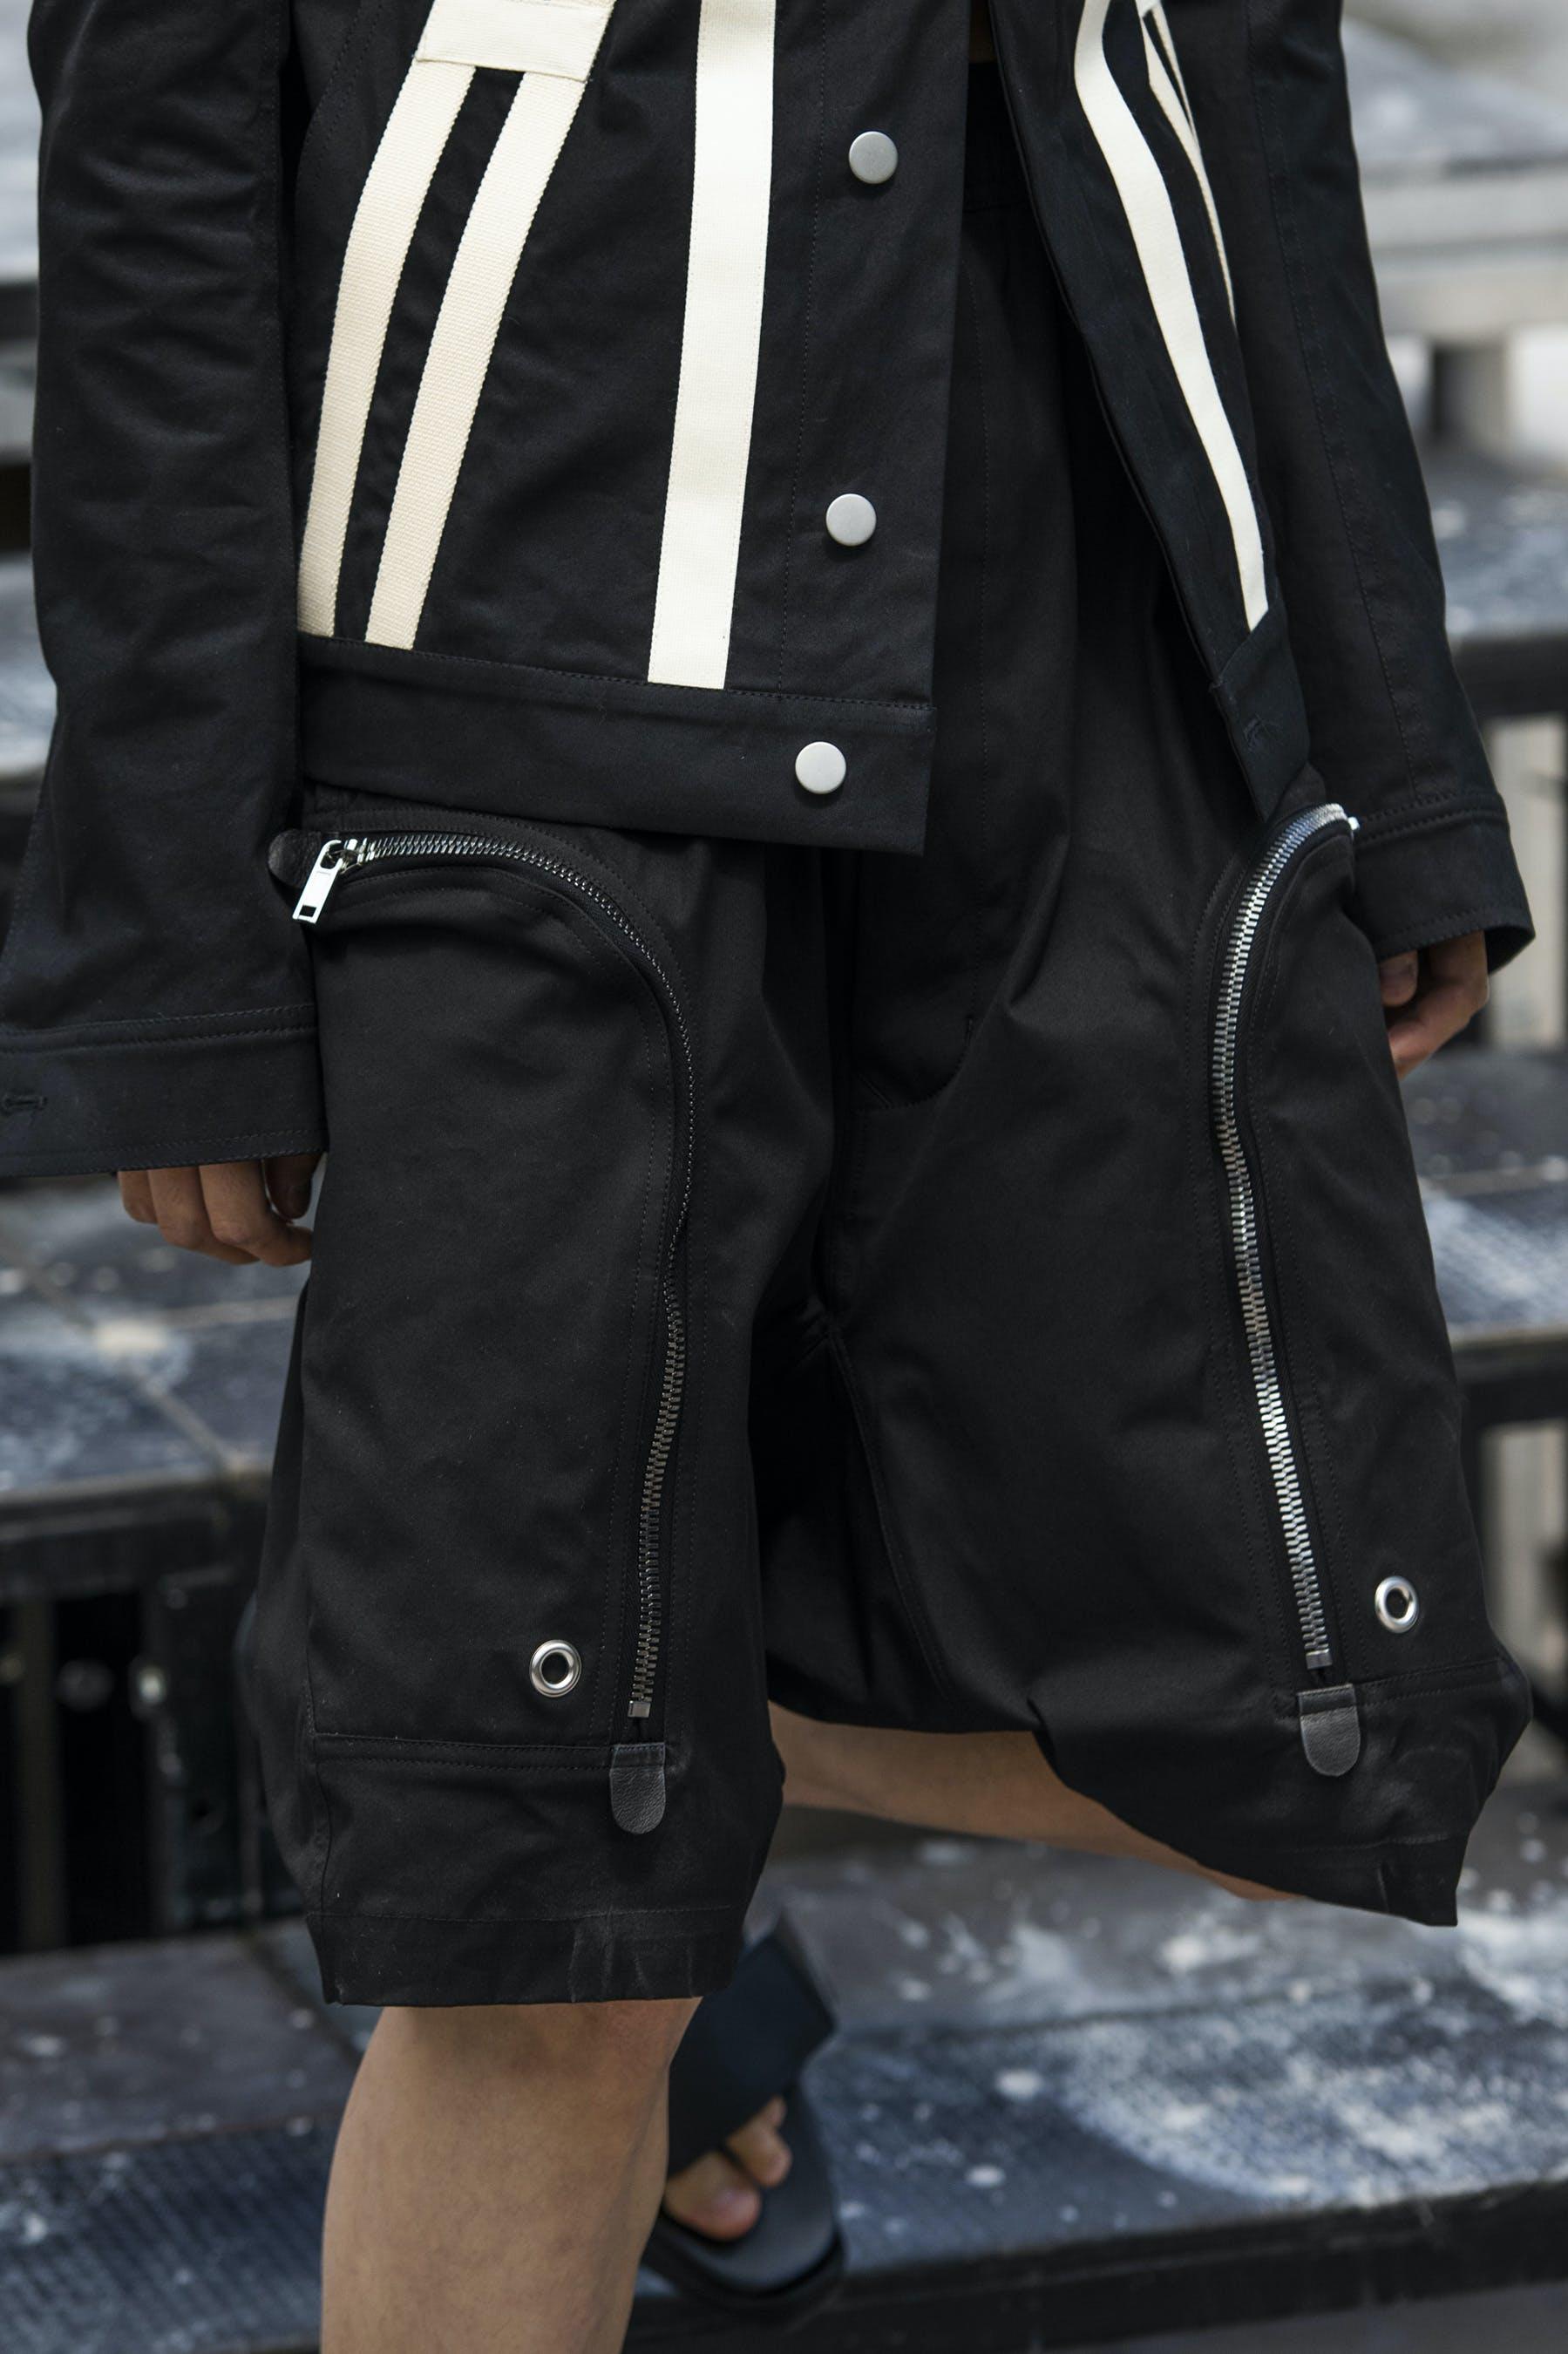 Rick Owens Runway Details Off The Runway Lab Pyramid Motif Jacket Cargo Pods In Black Mens SS20 Tecautl